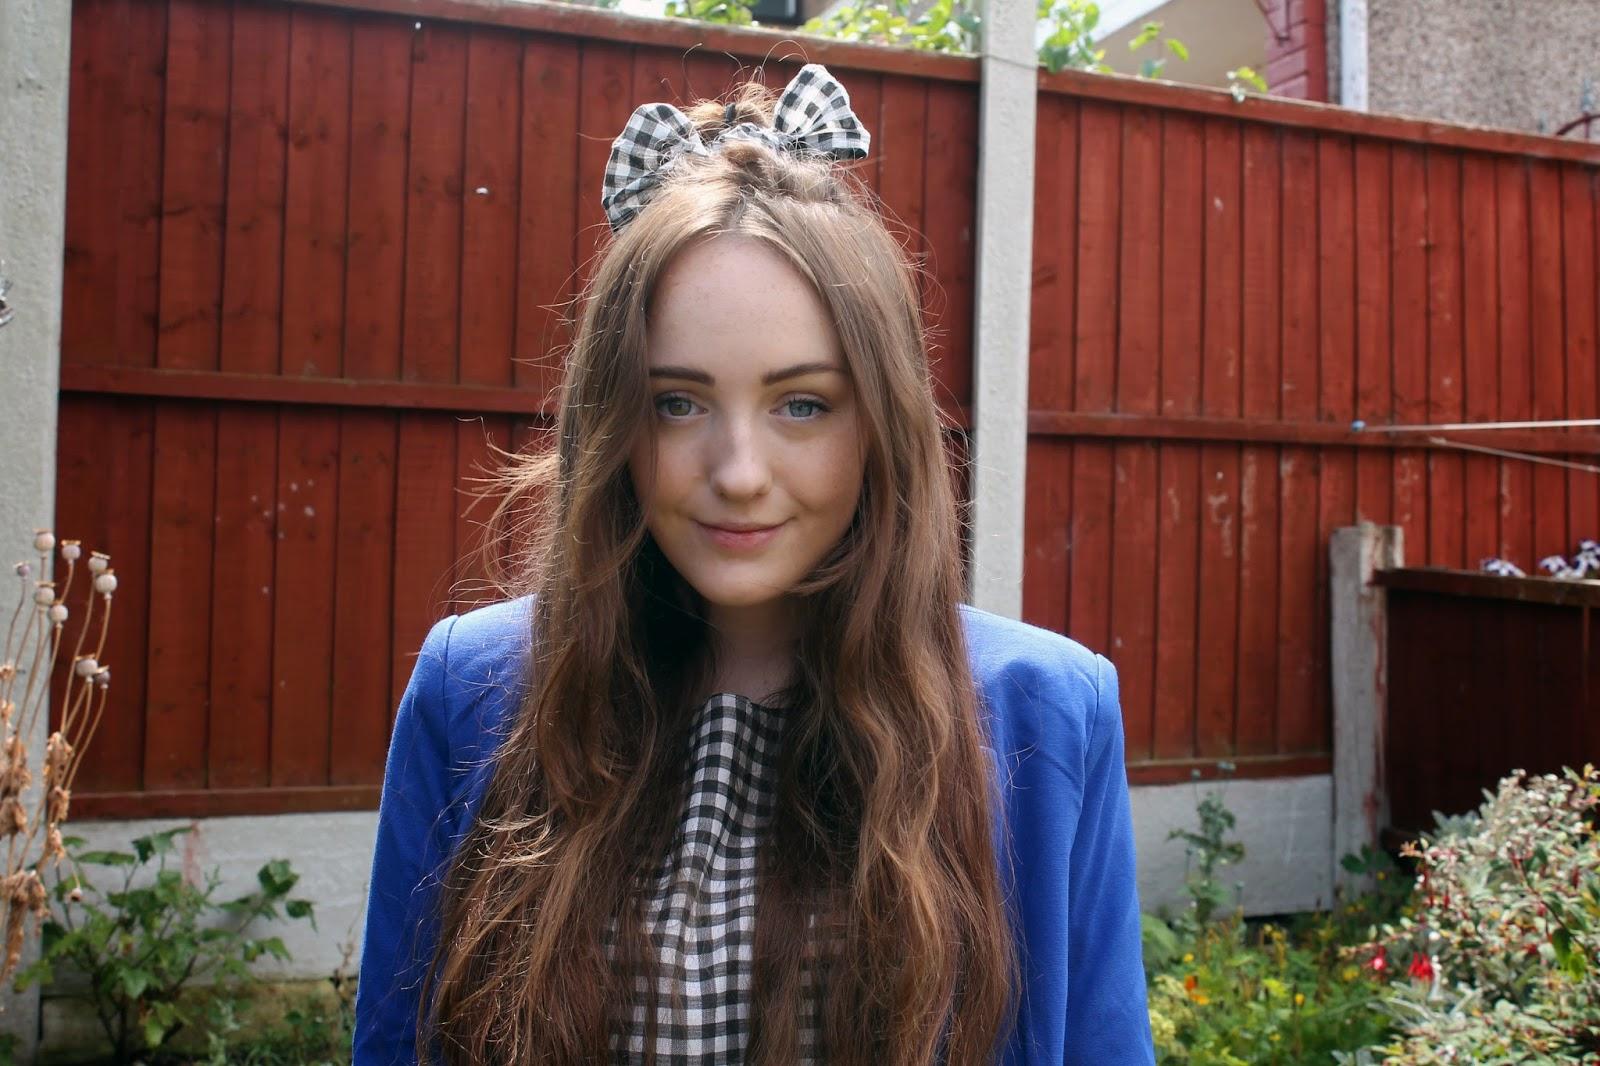 gingham hairbow, DIY hair accessory, heterochromia iridium